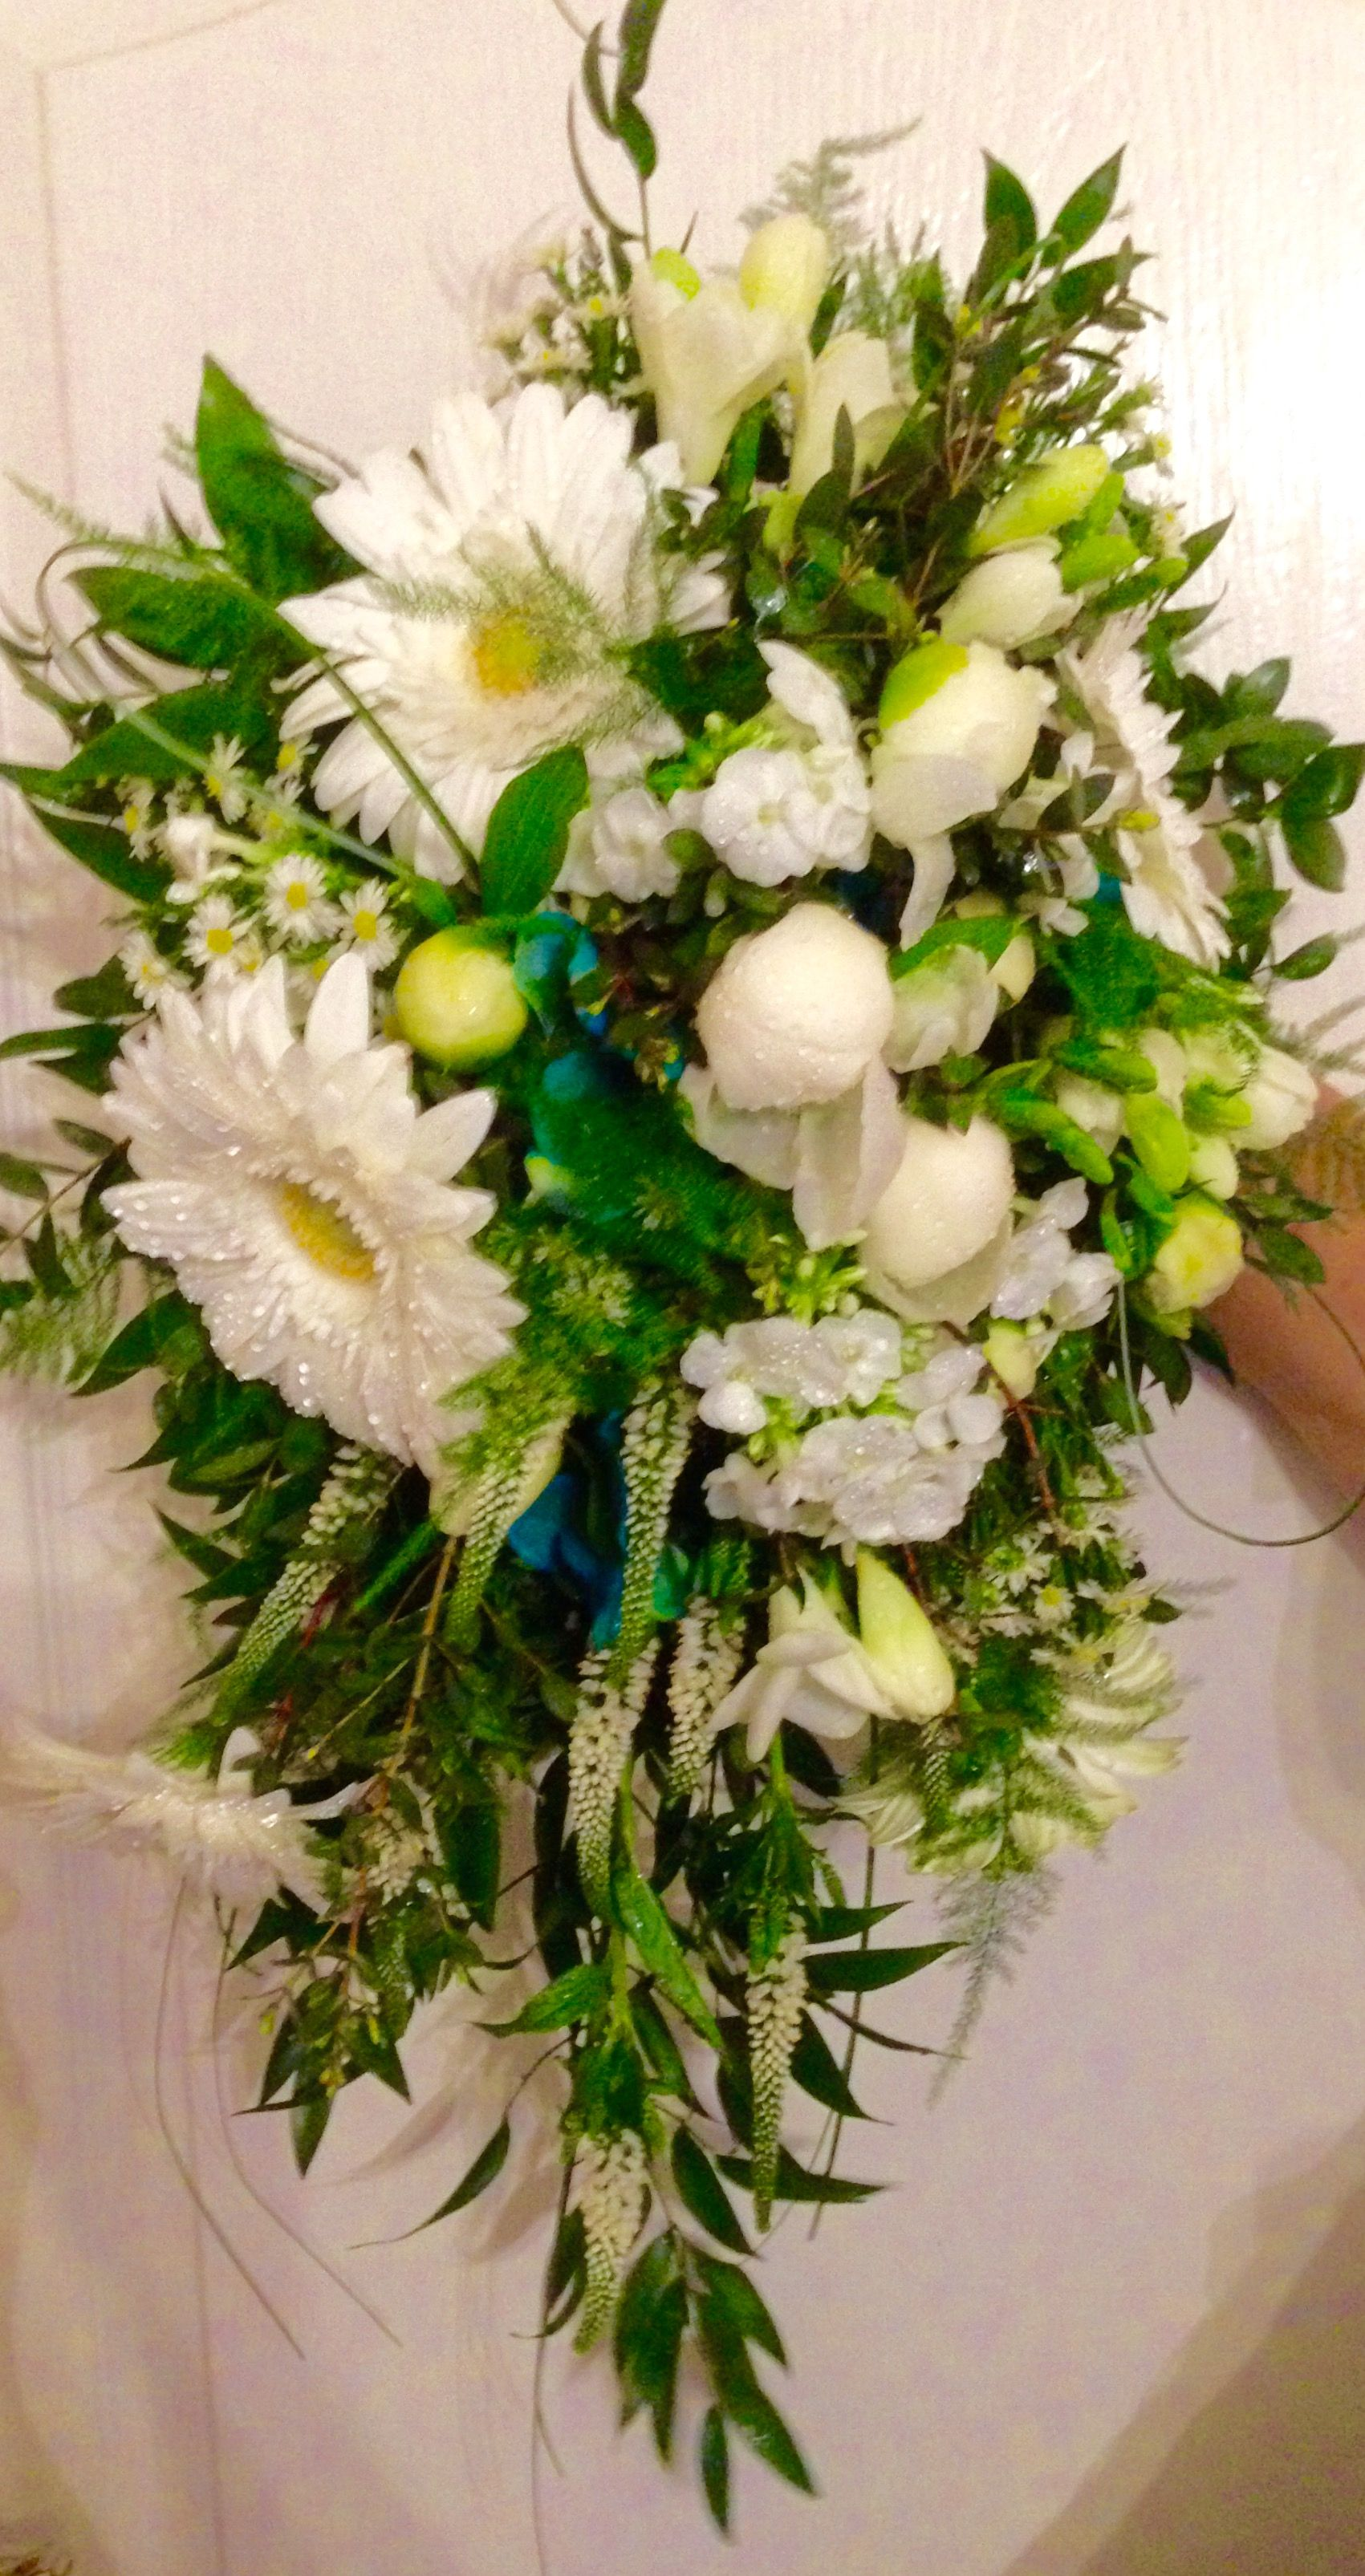 Fresh flower bridal bouquet gerberas peonies veronica freesia fresh flower bridal bouquet gerberas peonies veronica freesia and michaelmas daisies izmirmasajfo